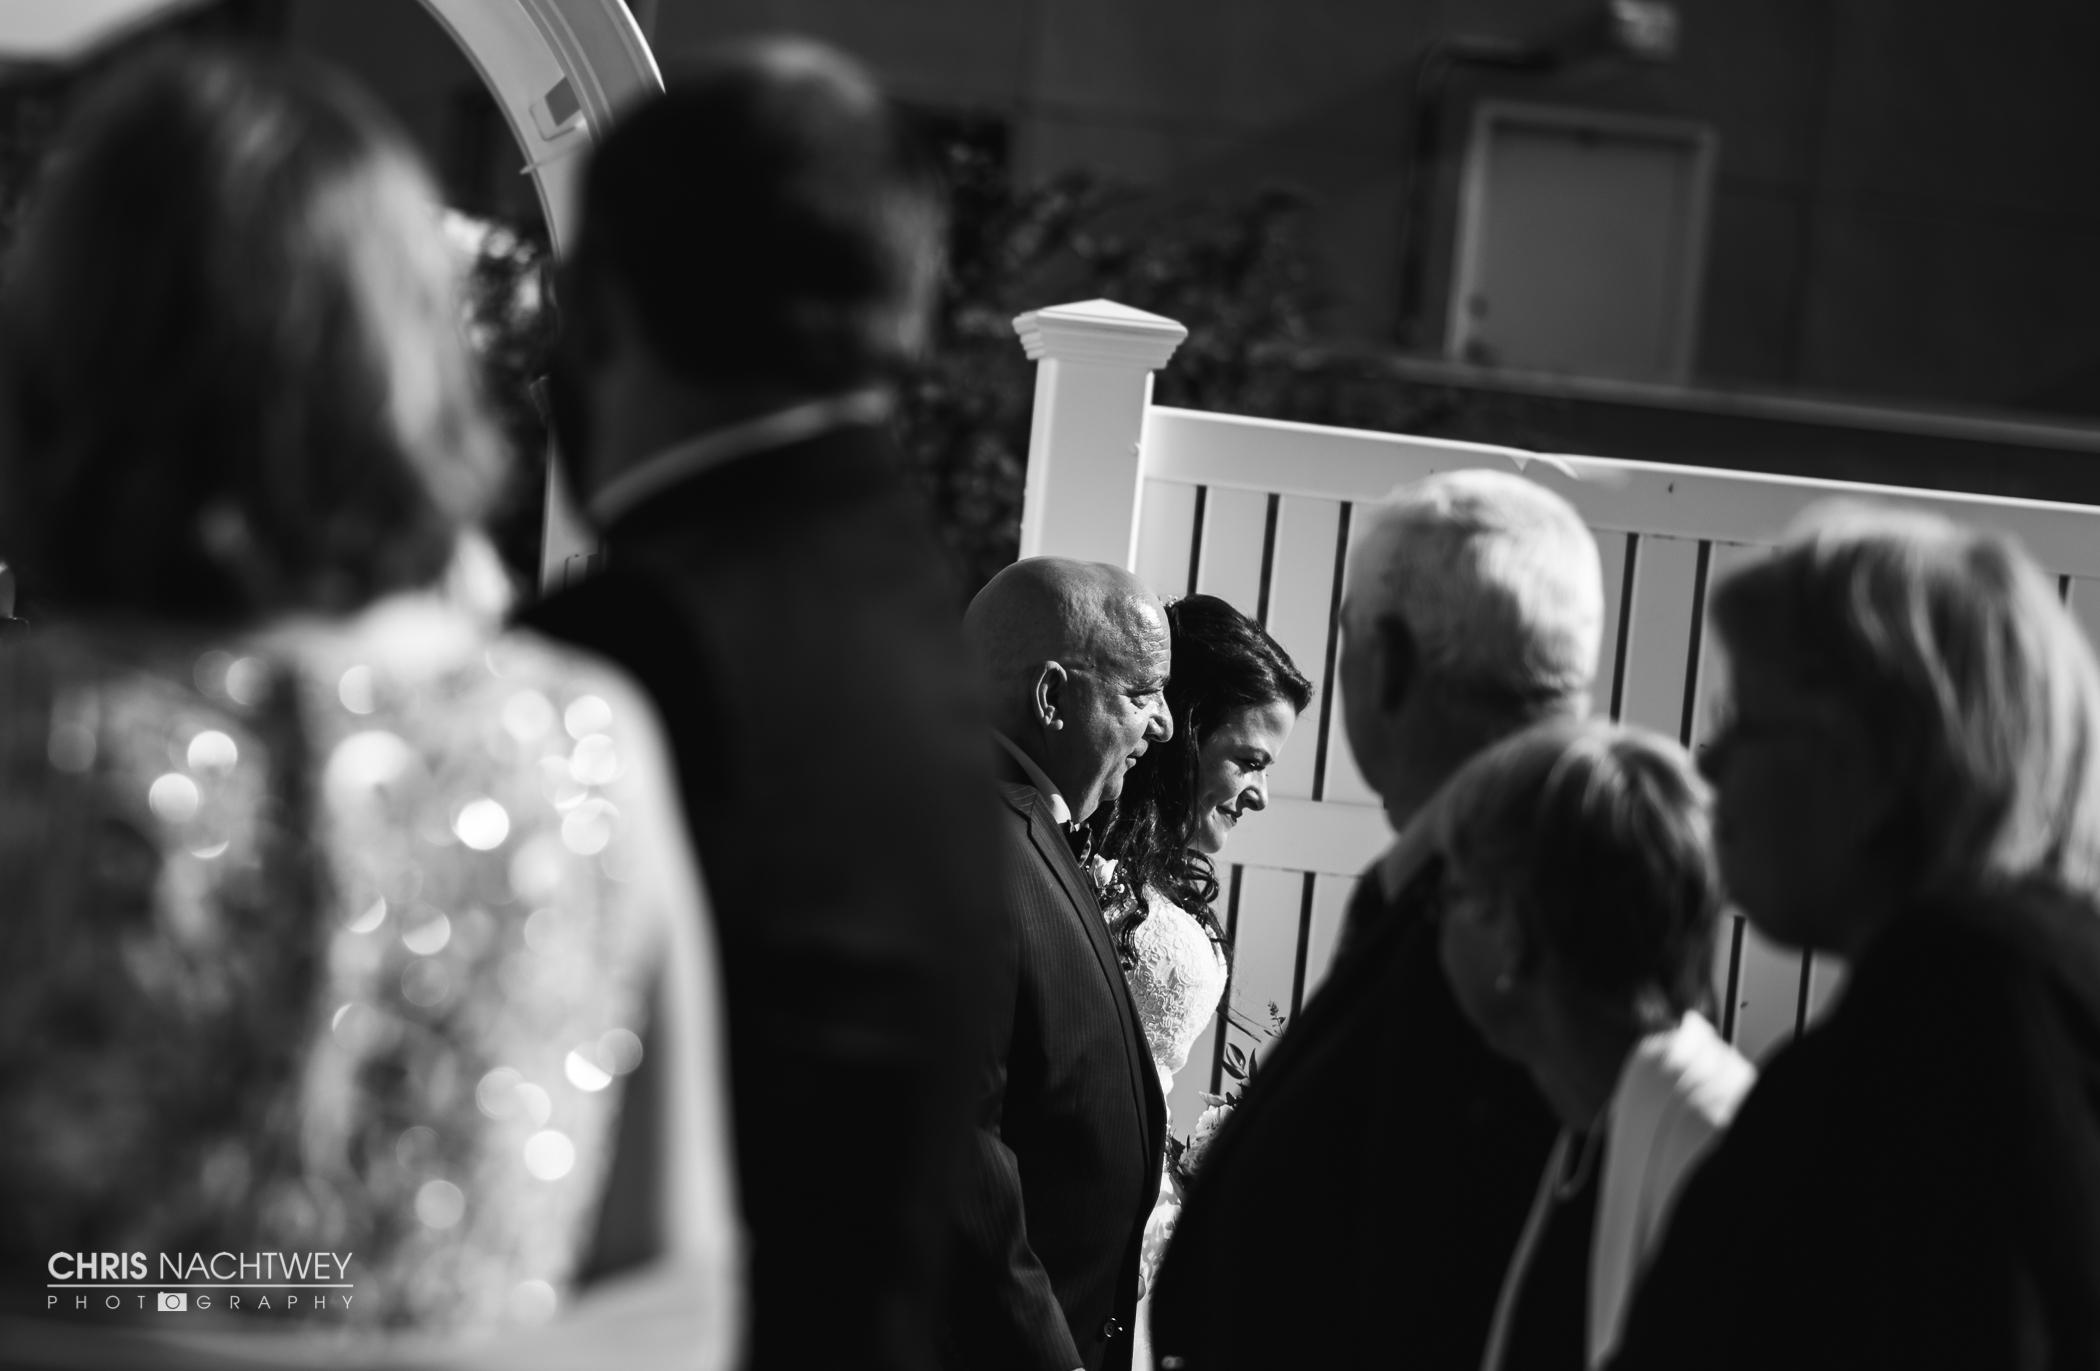 birchwoods-wedding-photographers-chris-nachtwey-amanda-pete-2017-11.jpg